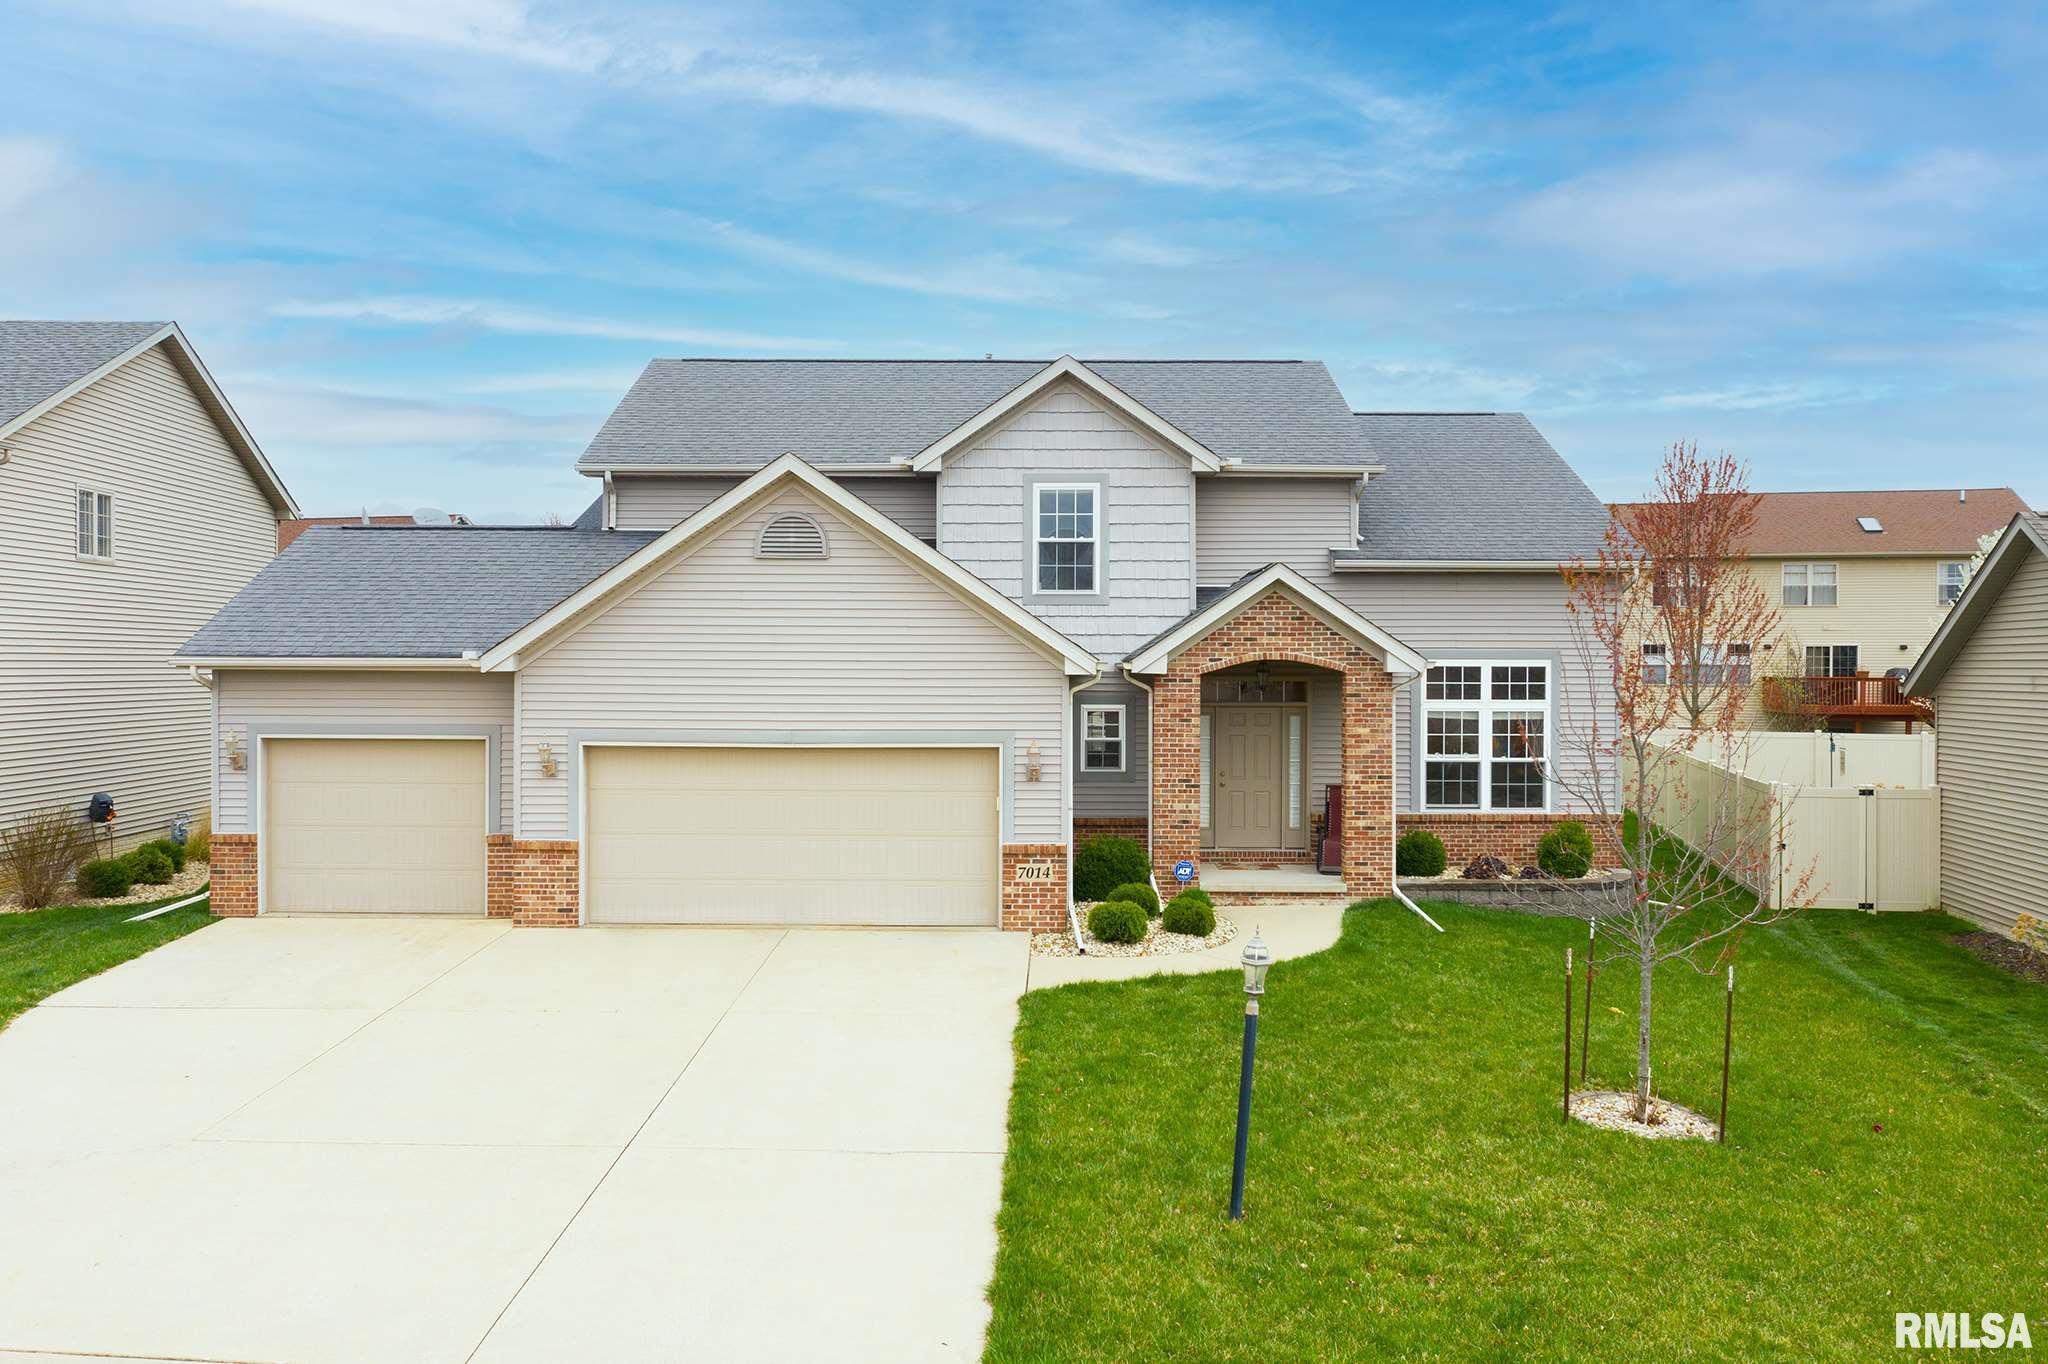 7014 N BUCKEYE Property Photo - Edwards, IL real estate listing